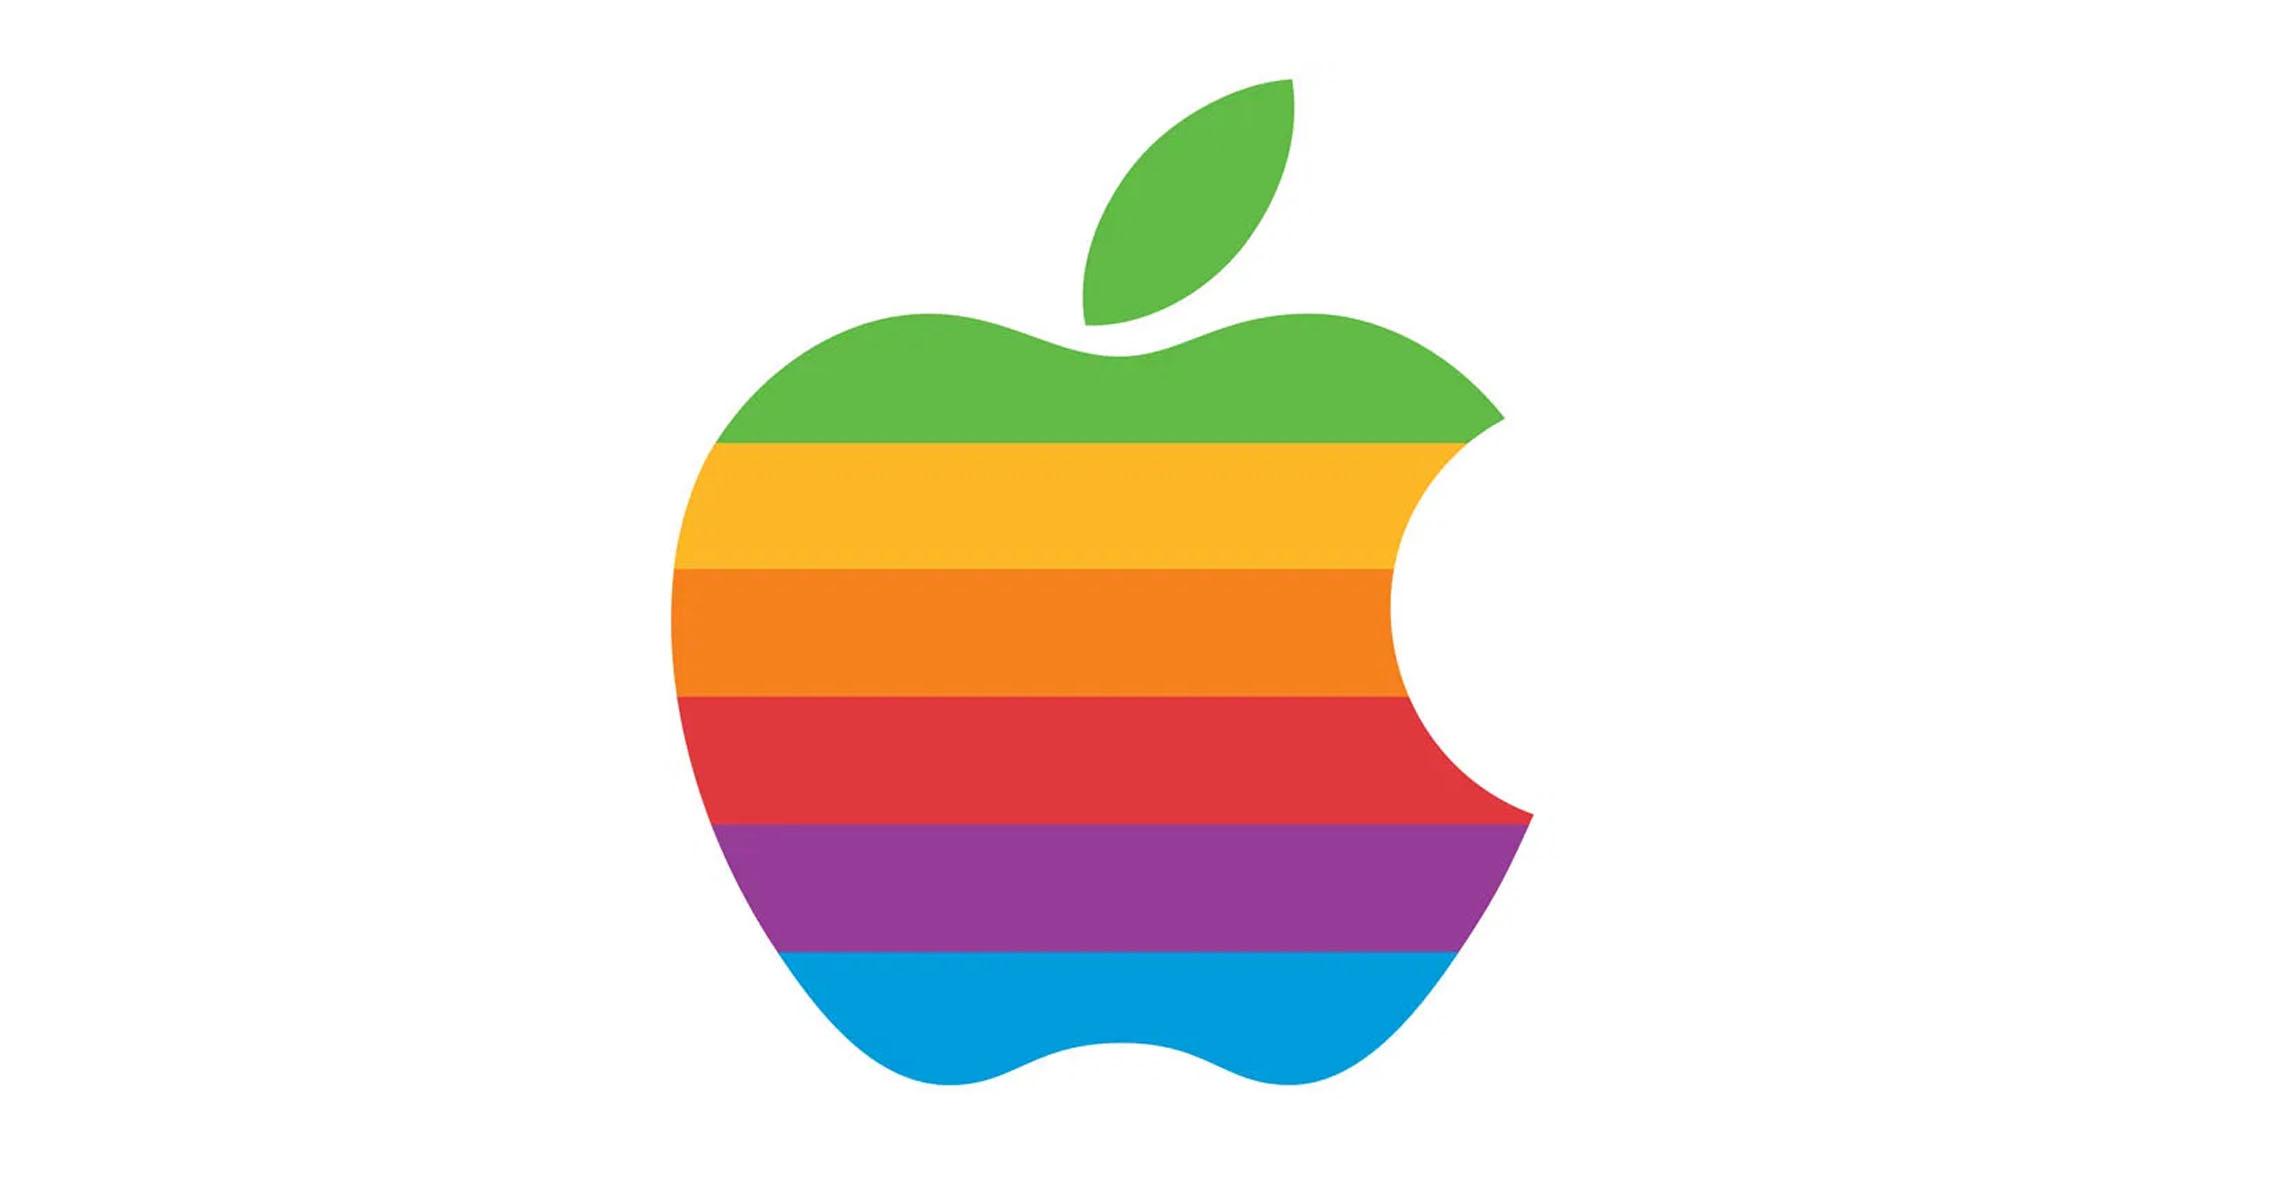 Second Apple Logo